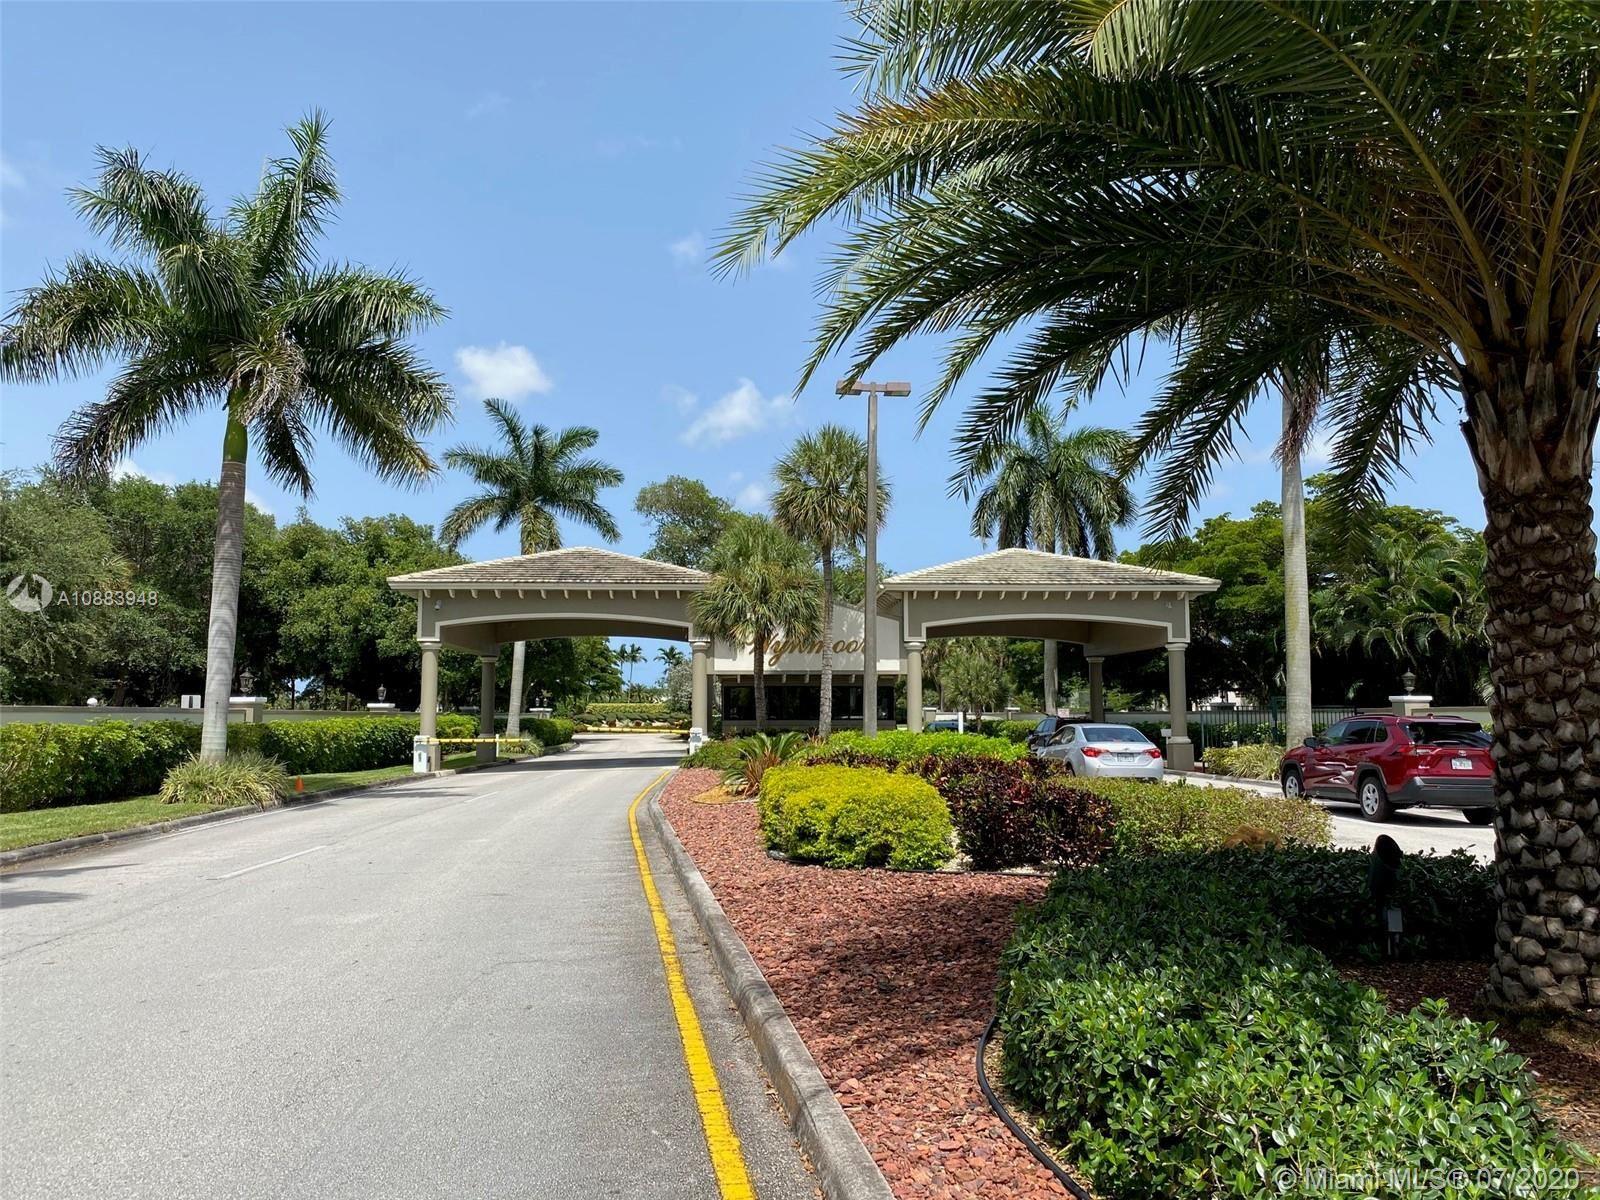 2703 Nassau Bnd #E2, Coconut Creek, FL 33066 - #: A10883948